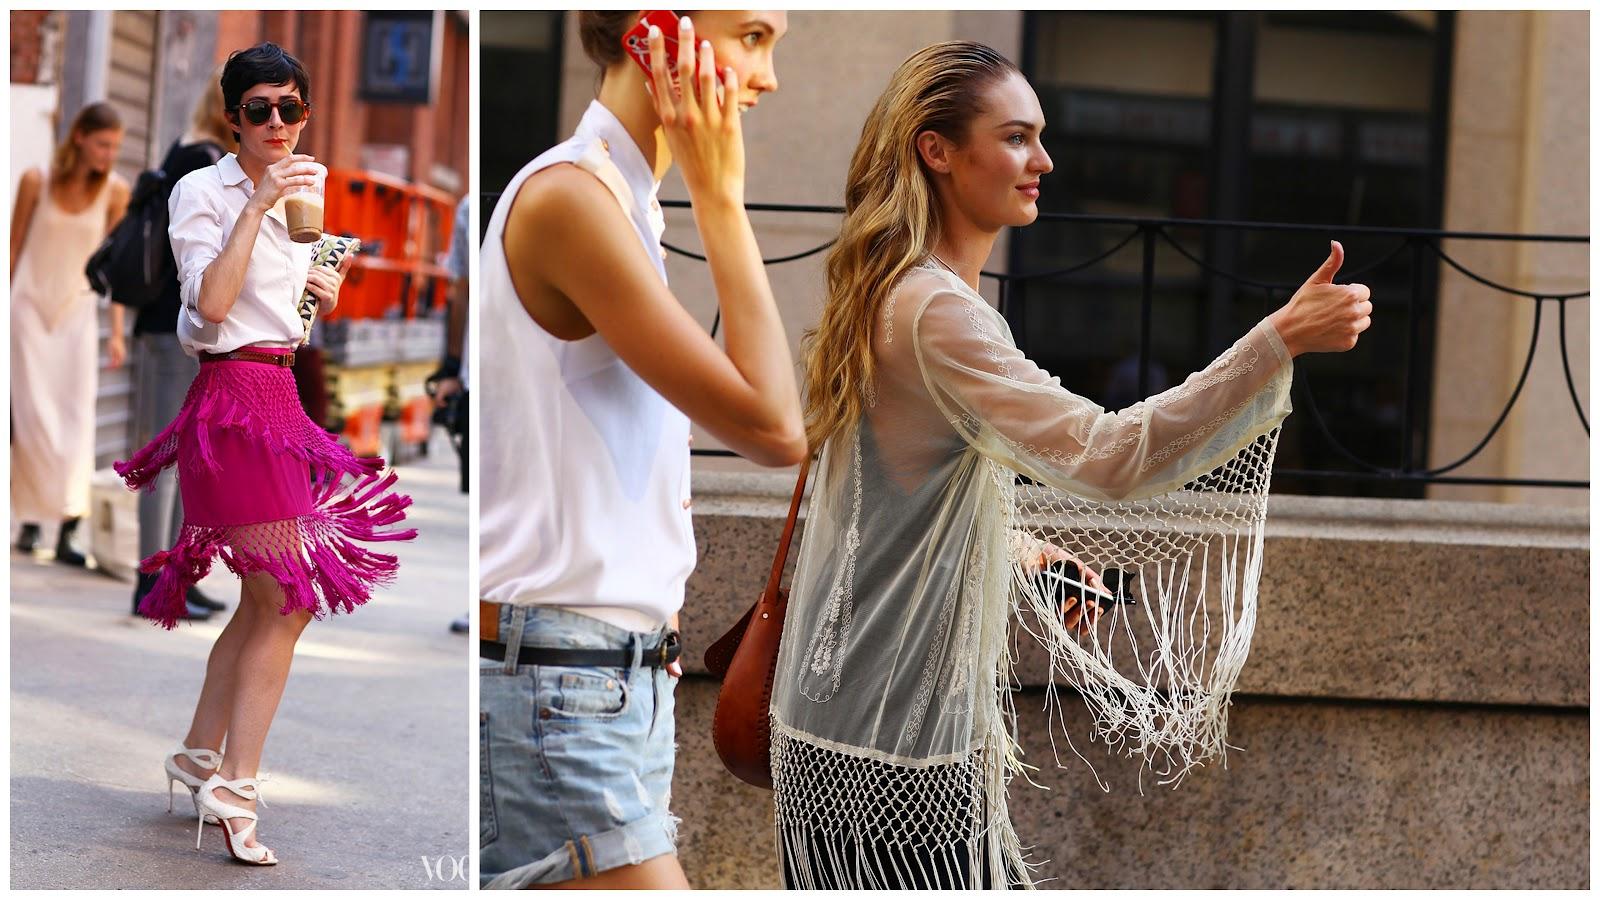 http://3.bp.blogspot.com/-rbSqXhMfn6c/UE-eoKlXt3I/AAAAAAAAM9o/WrN03qx9pmo/s1600/nyfw+ny+fashion+week+street+style+misses+disaster+fringe.jpg